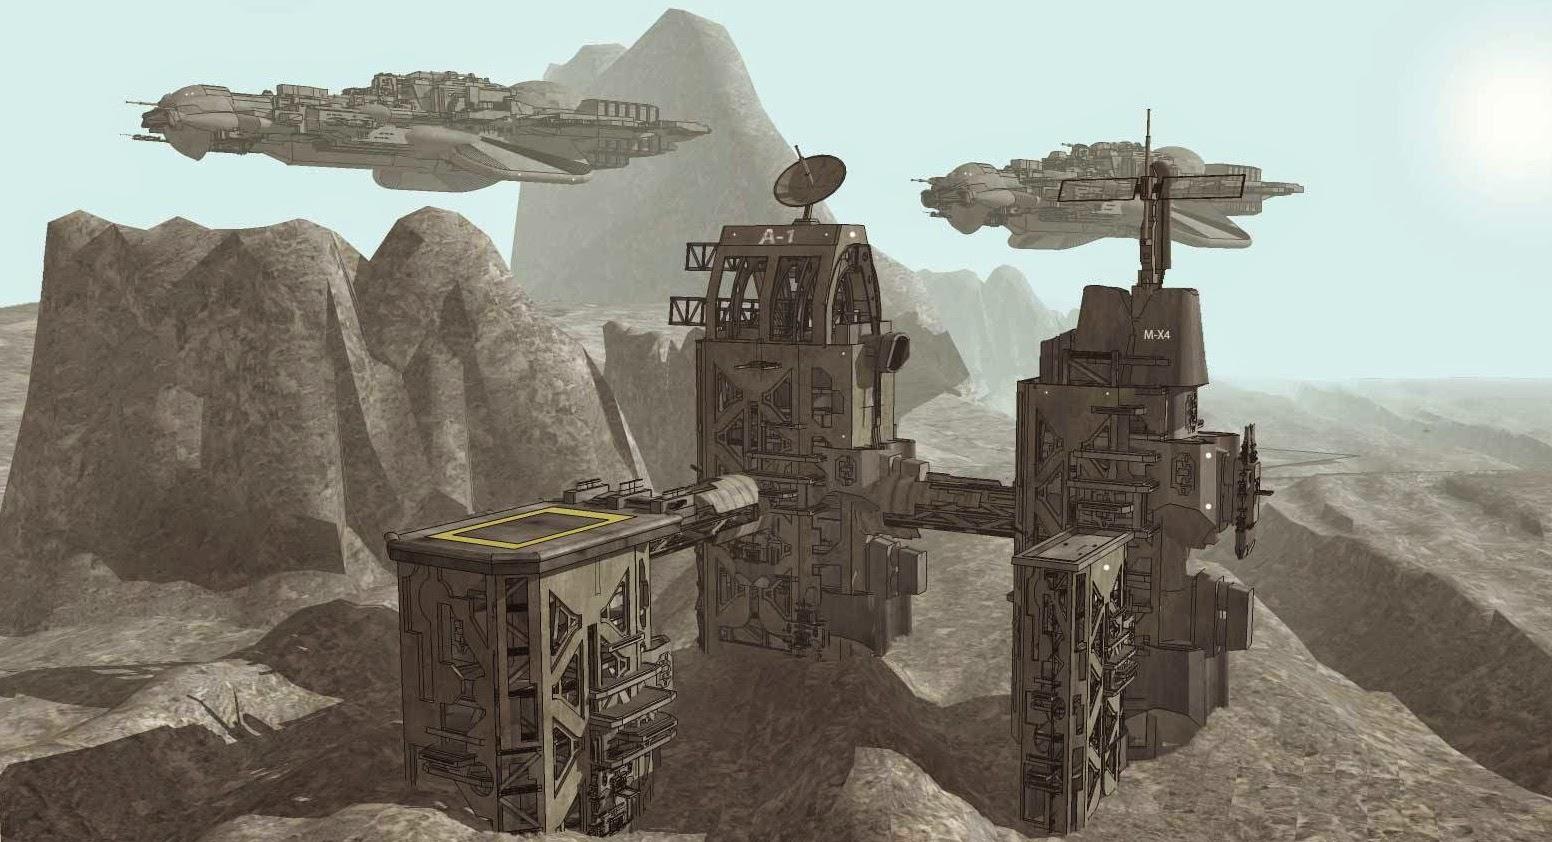 Starships arrive at colony